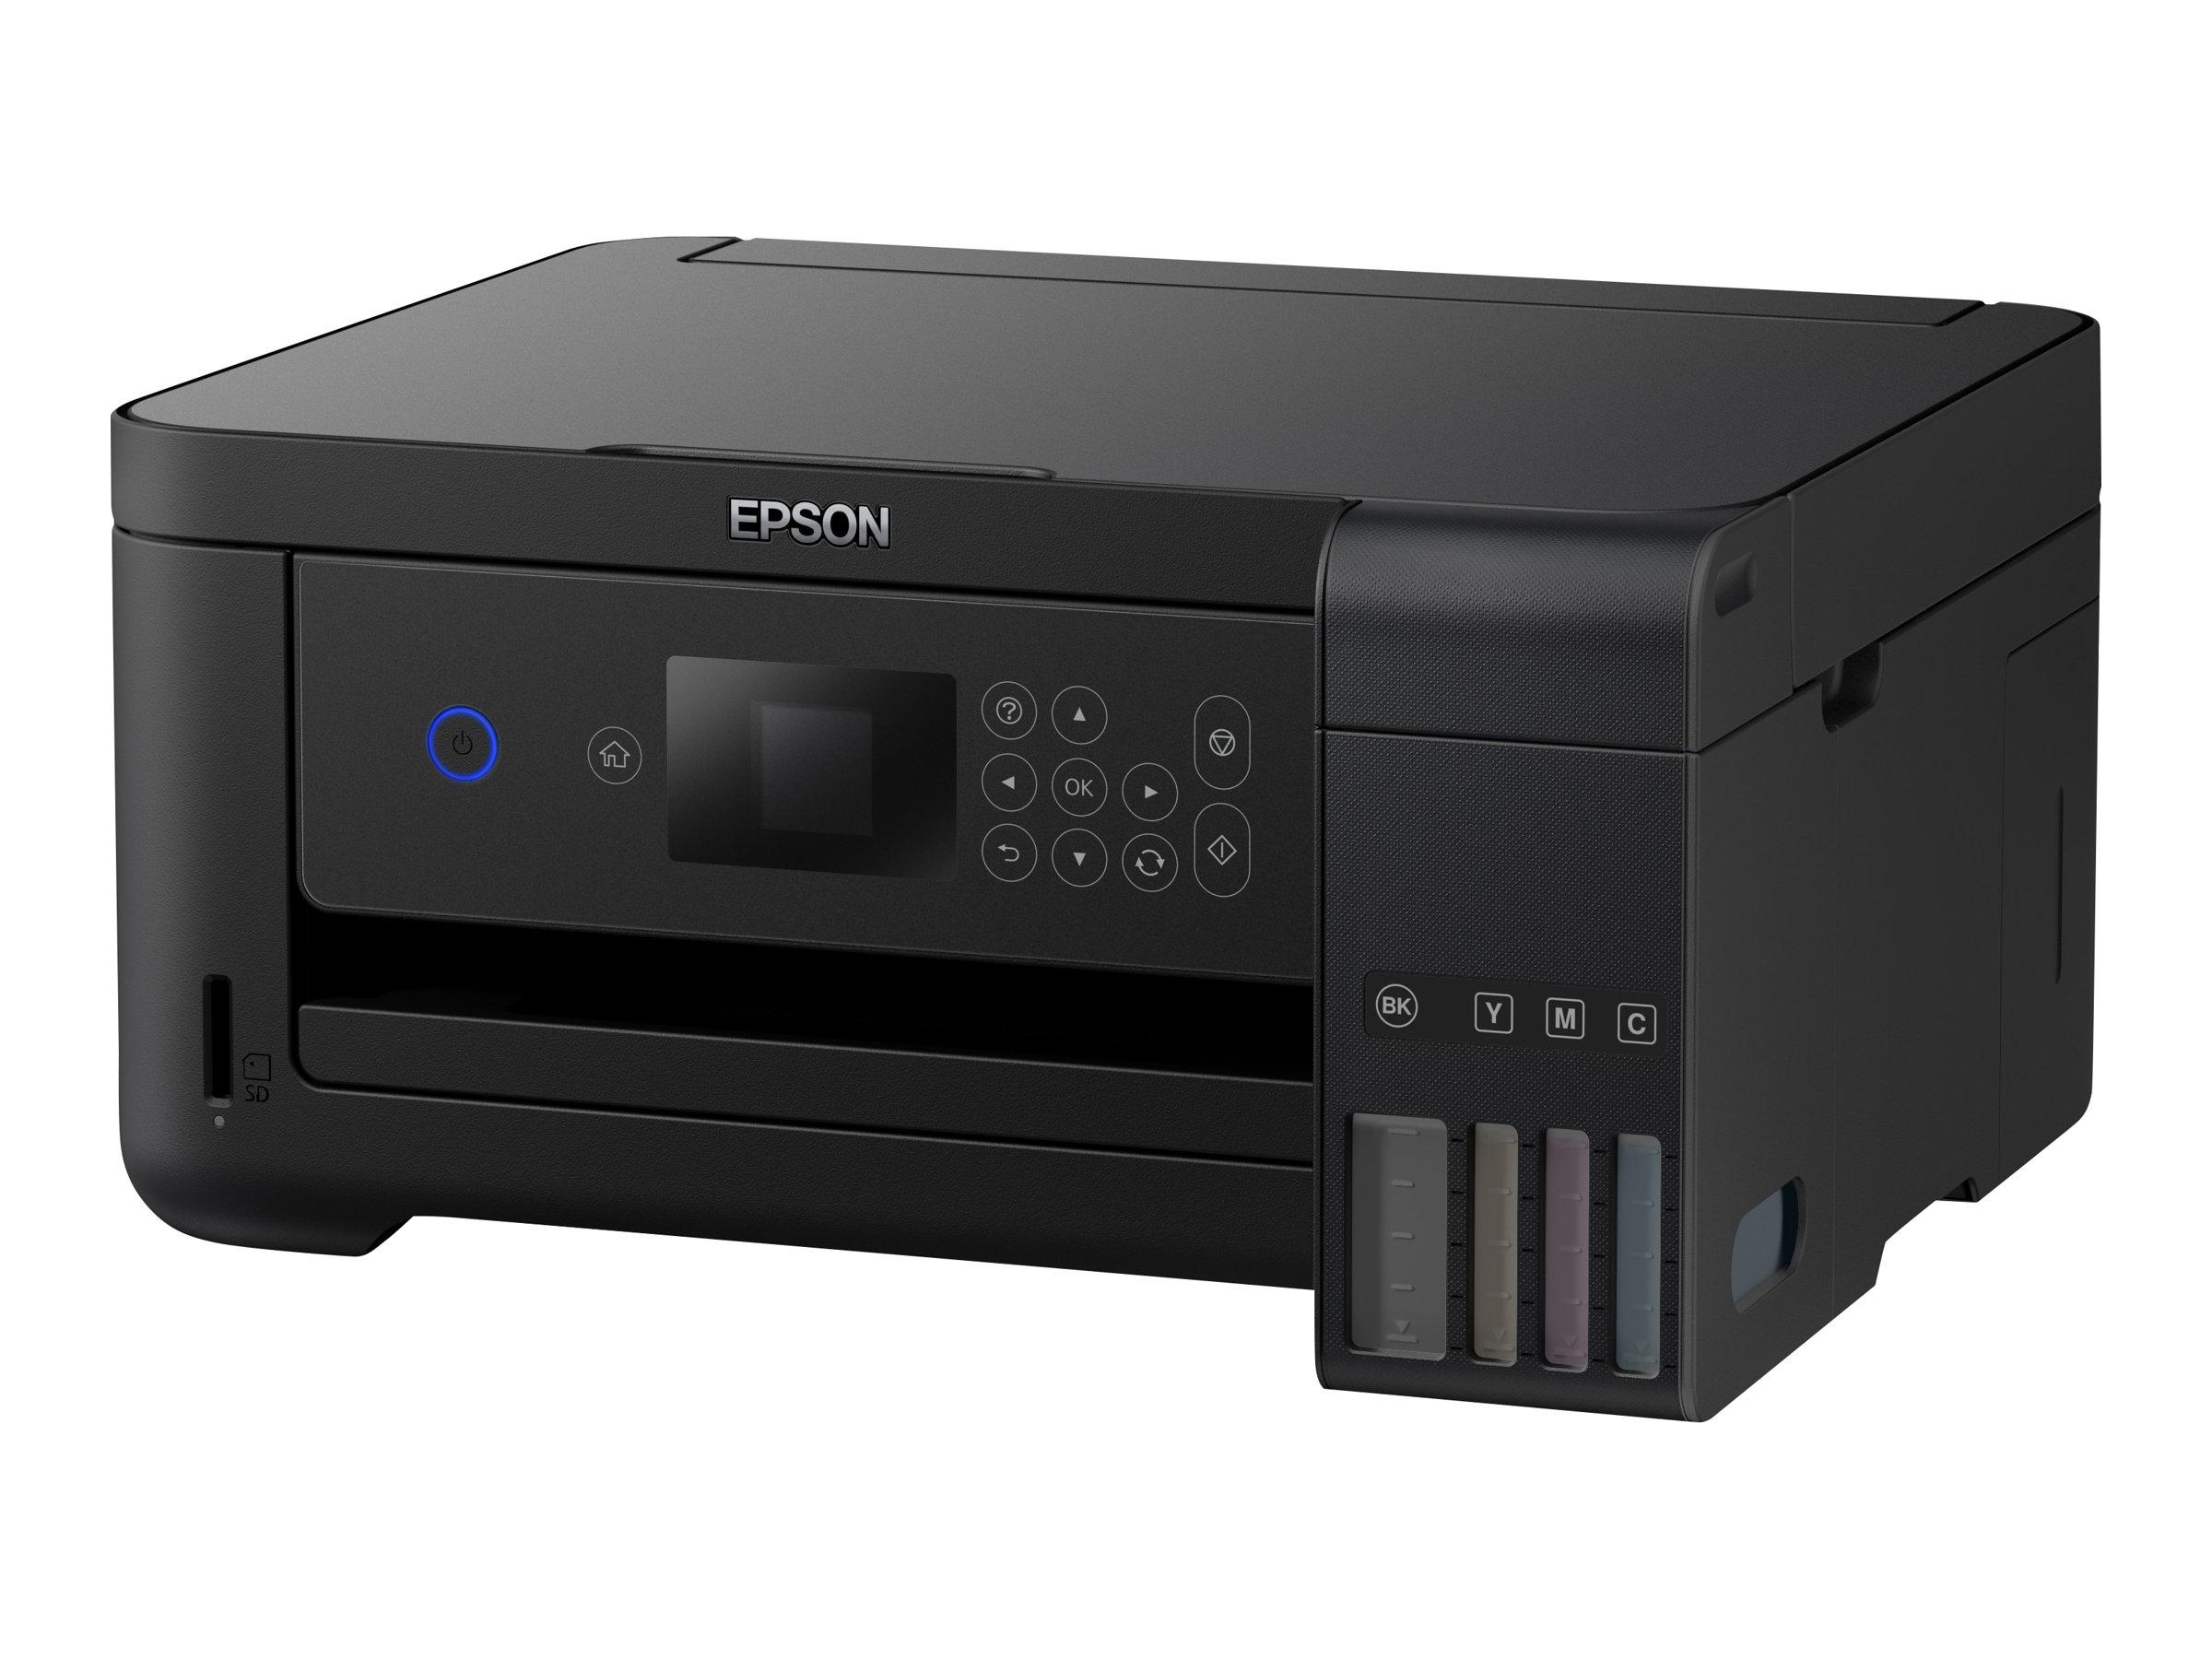 Epson EcoTank ET-2750 - Multifunktionsdrucker - Farbe - Tintenstrahl - Letter A (216 x 279 mm)/